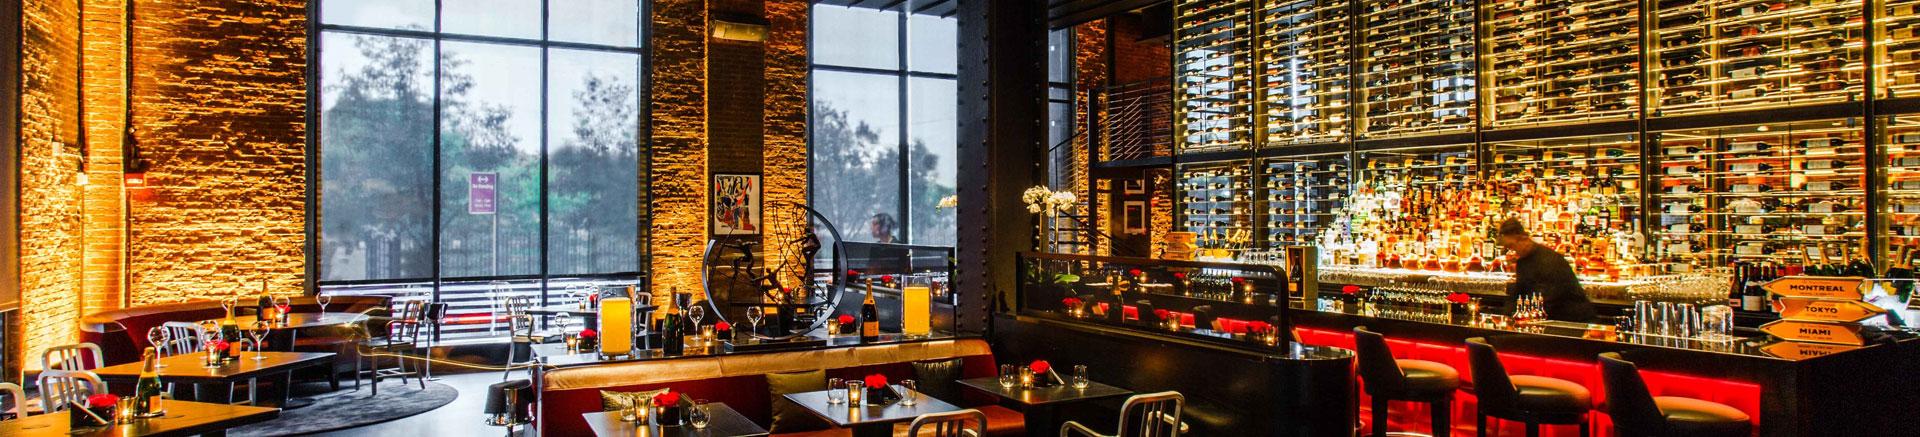 le monde de jo l robuchon restaurants le grill jo l robuchon new york. Black Bedroom Furniture Sets. Home Design Ideas